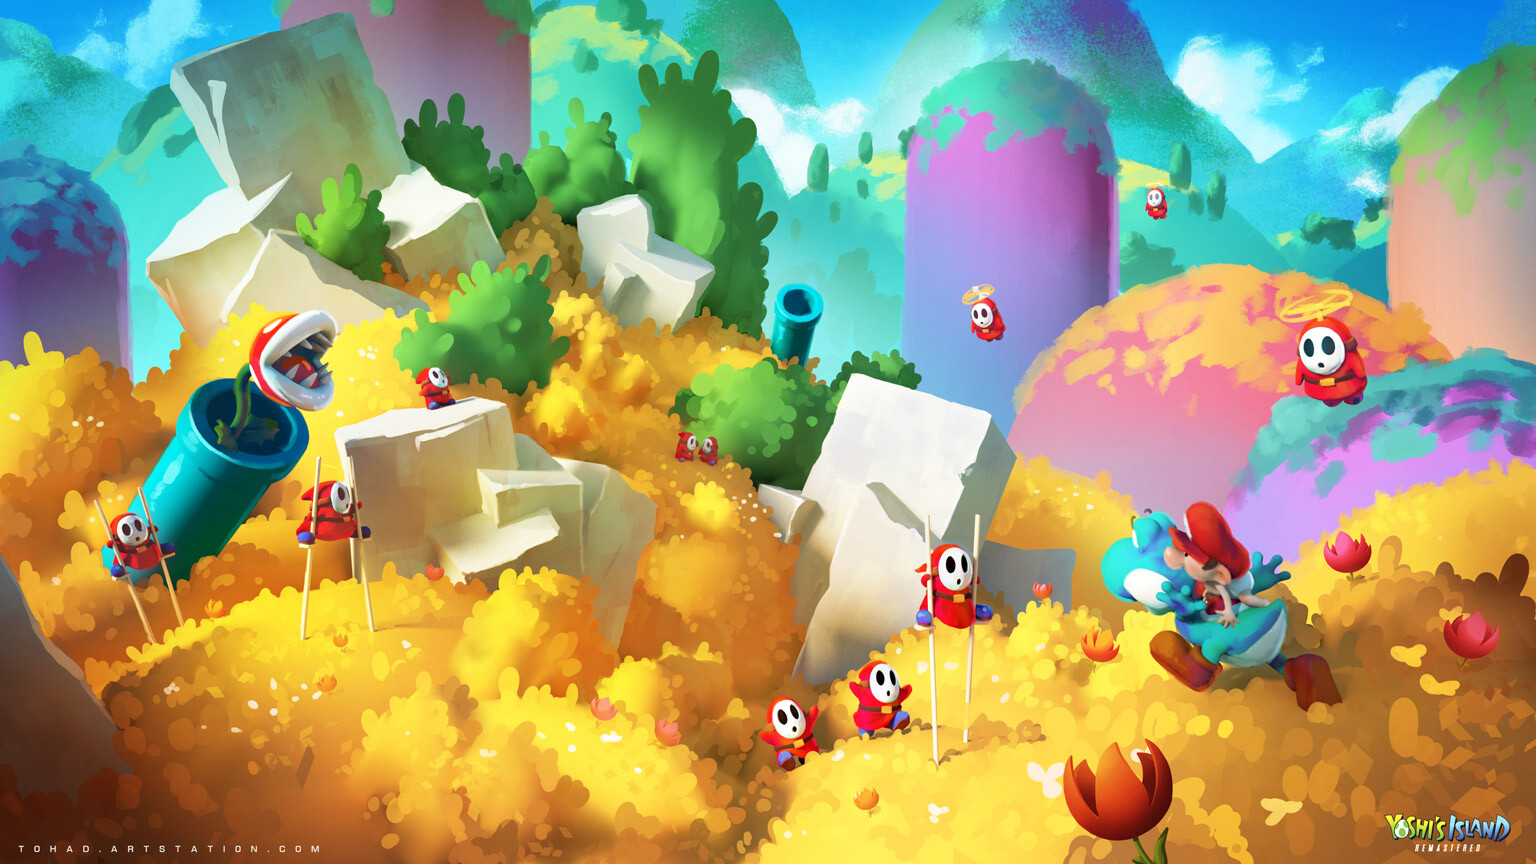 Yoshi's Island Remastered concept art : the hills